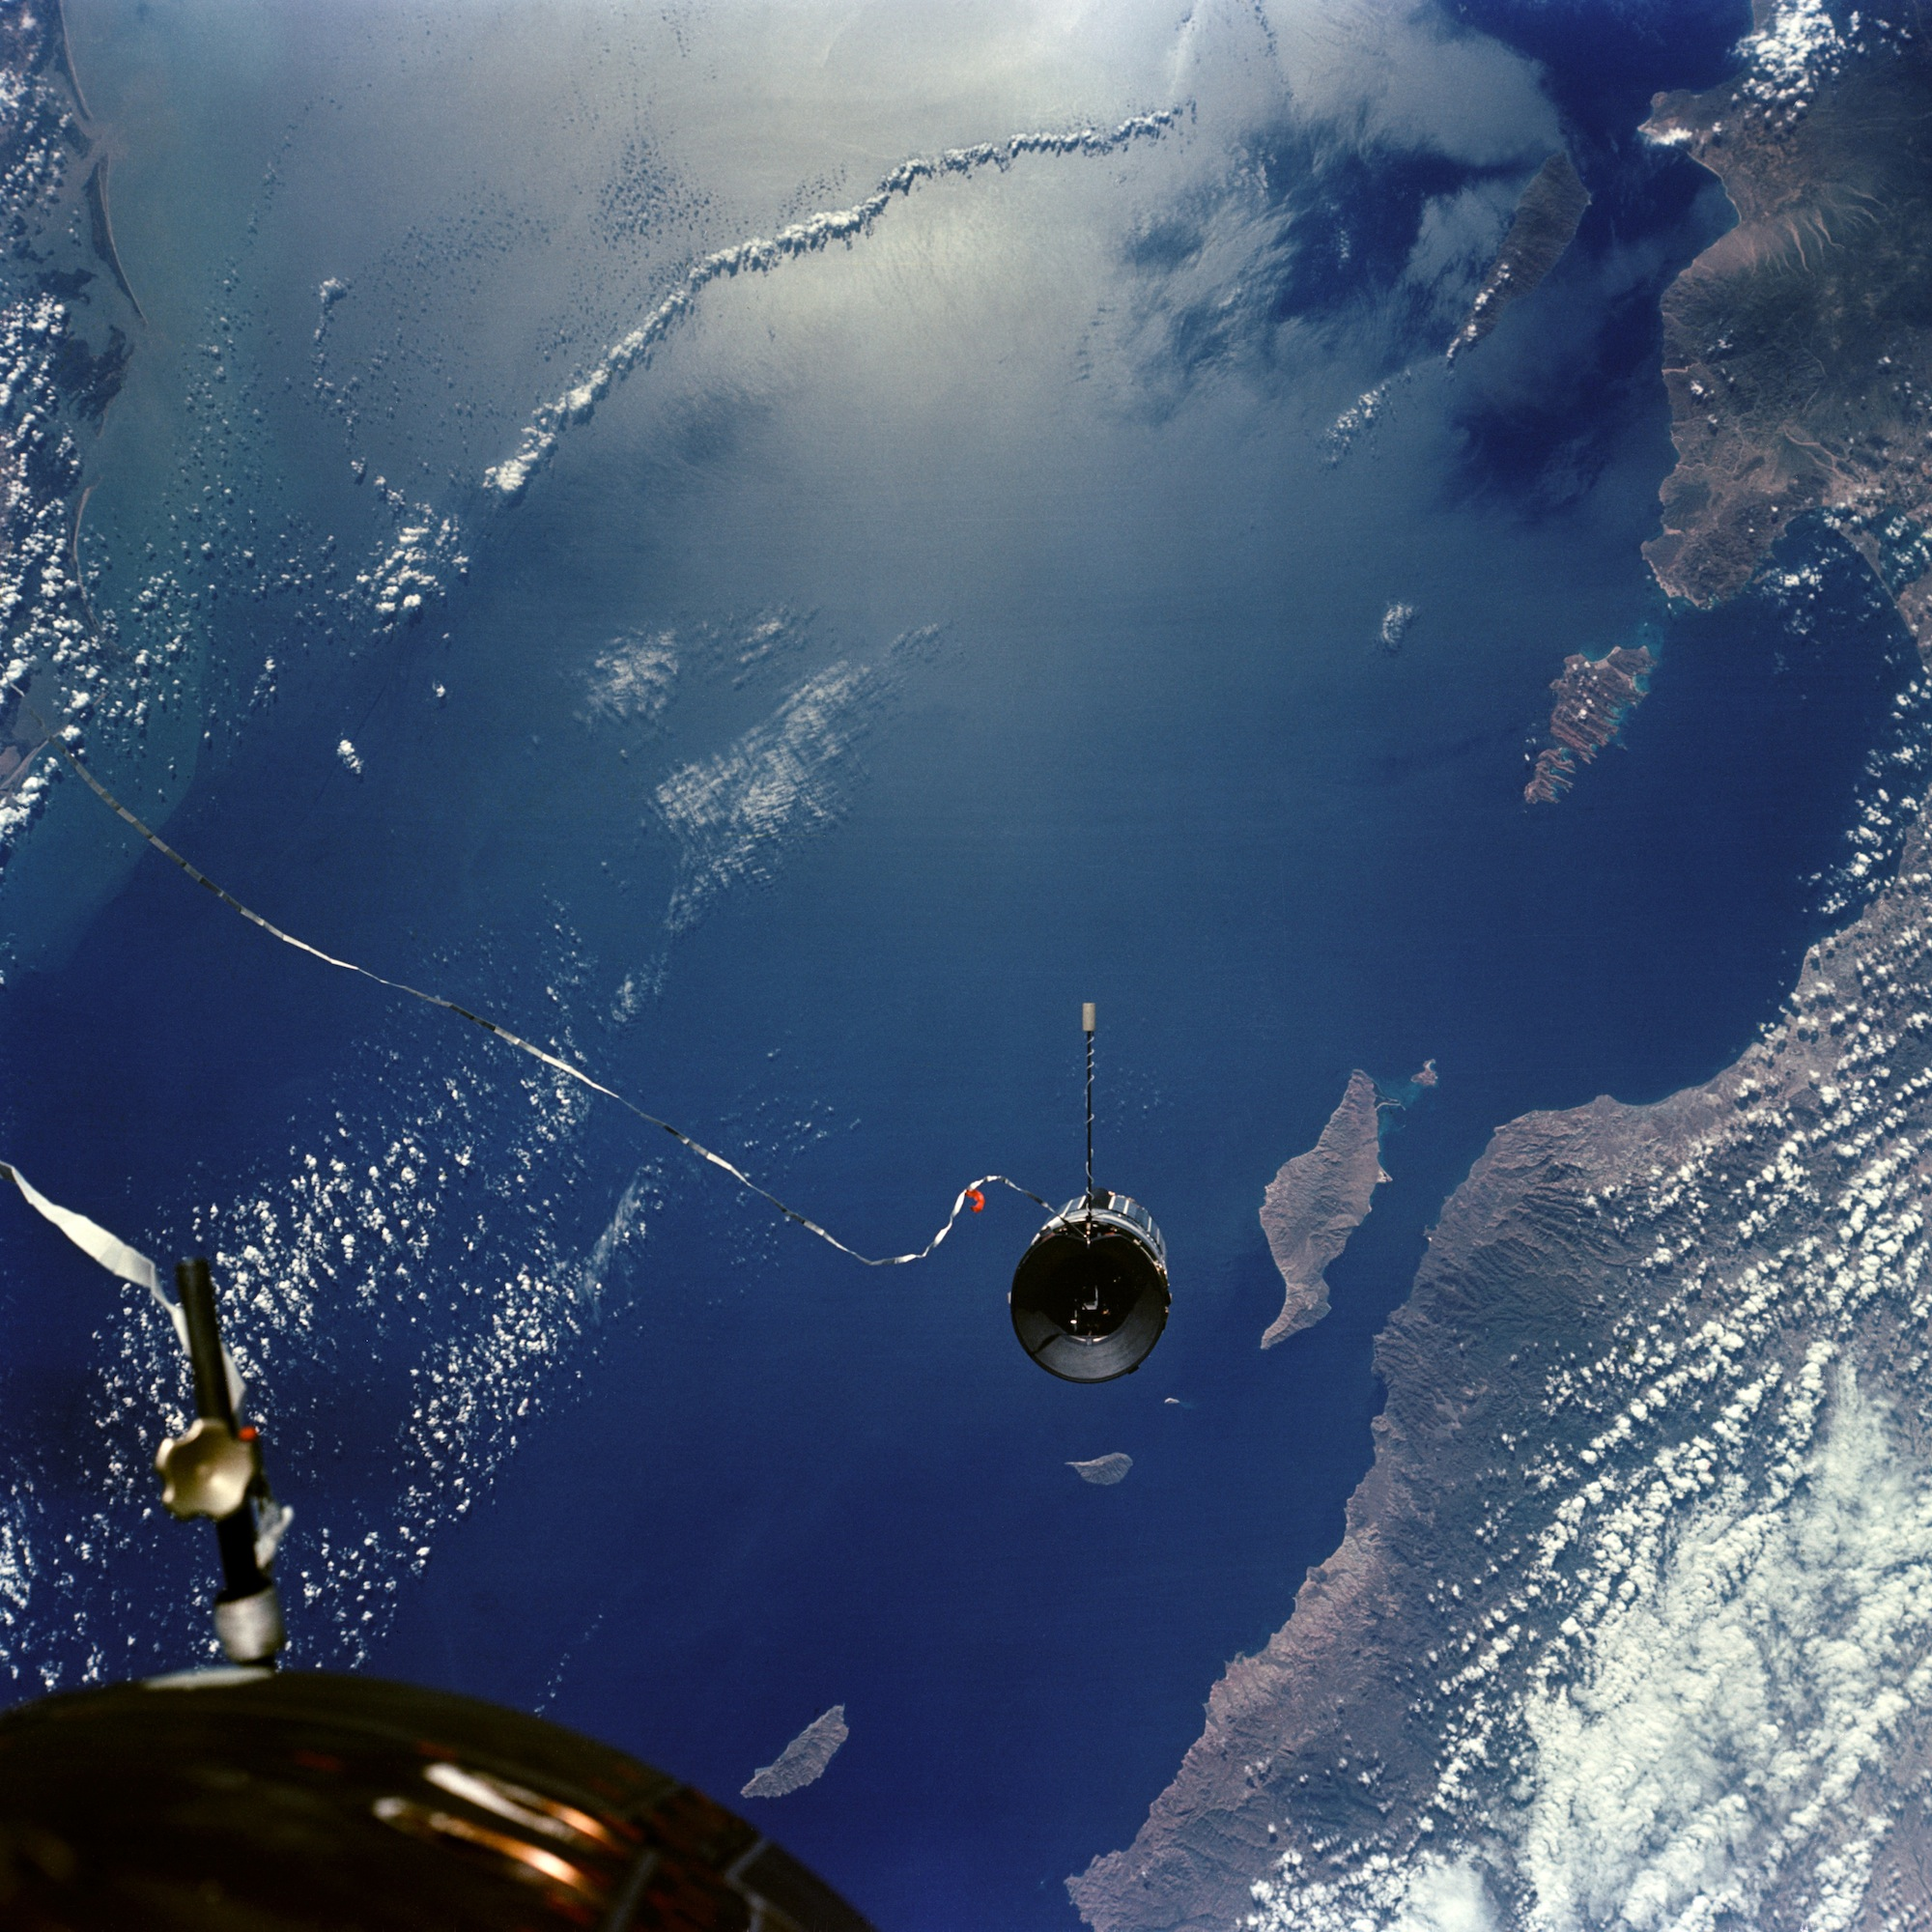 Gemini 11 Agena Gemini 11 and the Agena Target Vehicle